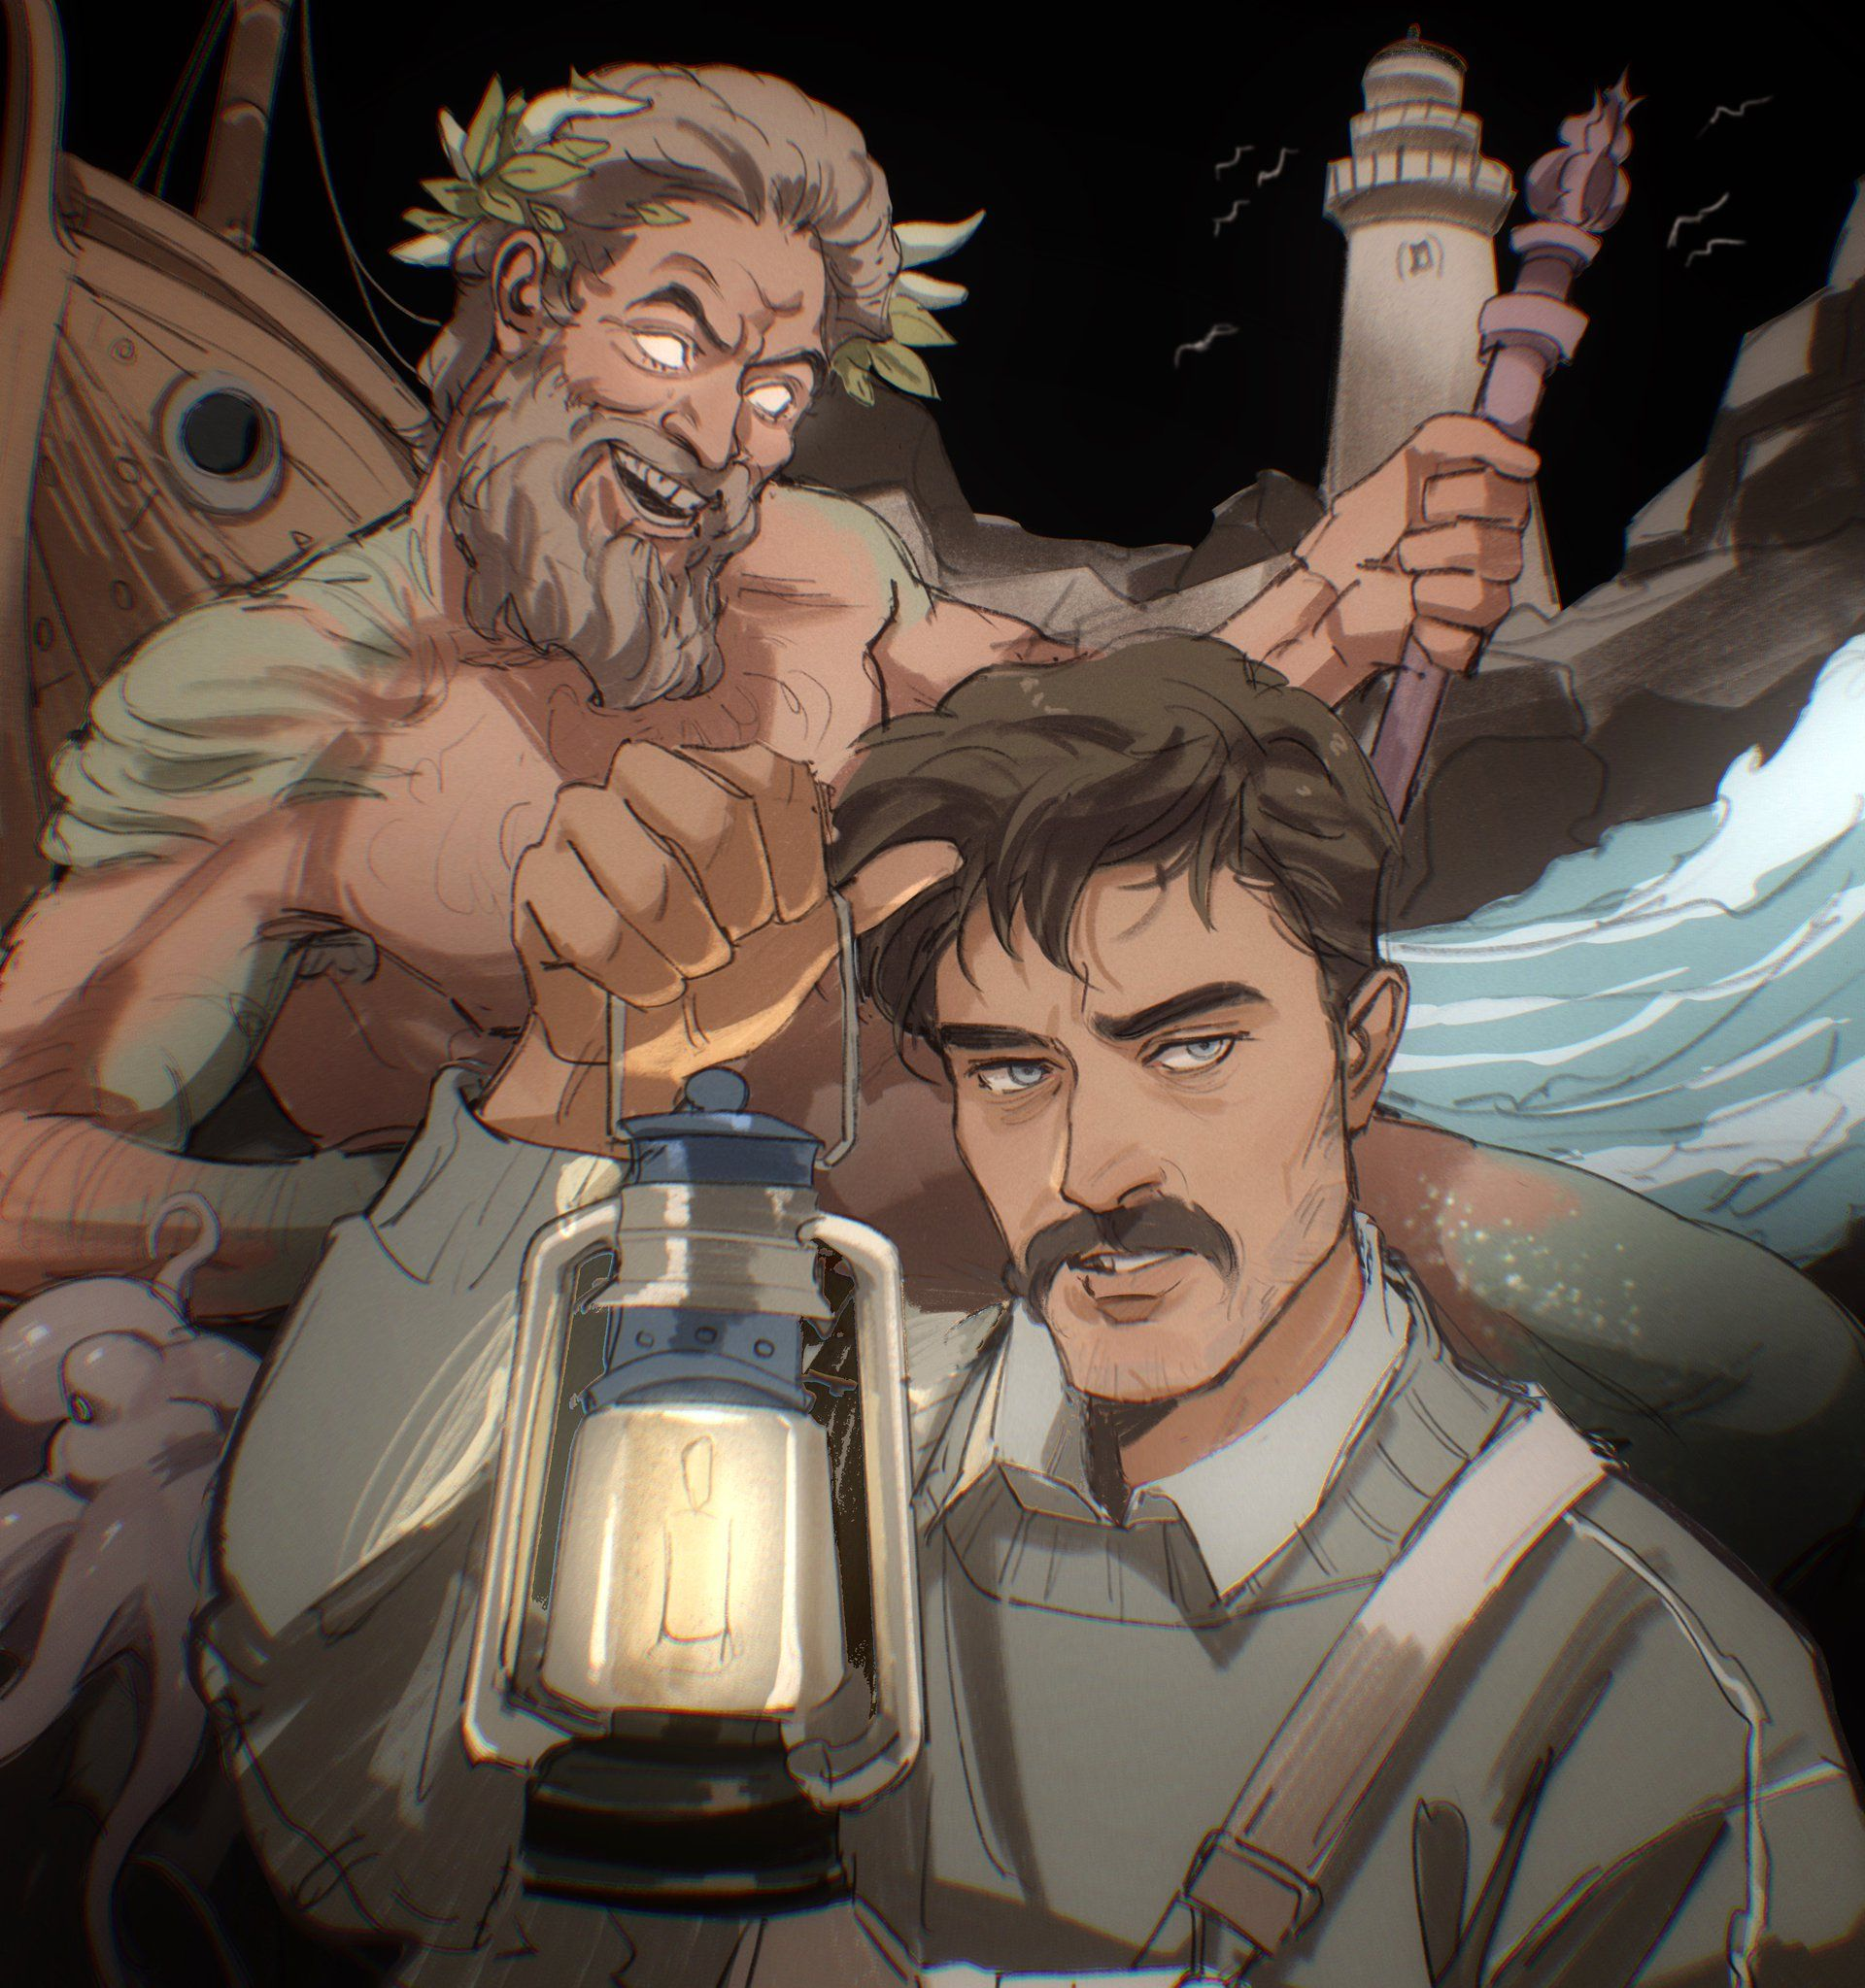 Columbo On Twitter Disney Concept Art Movie Art Columbo